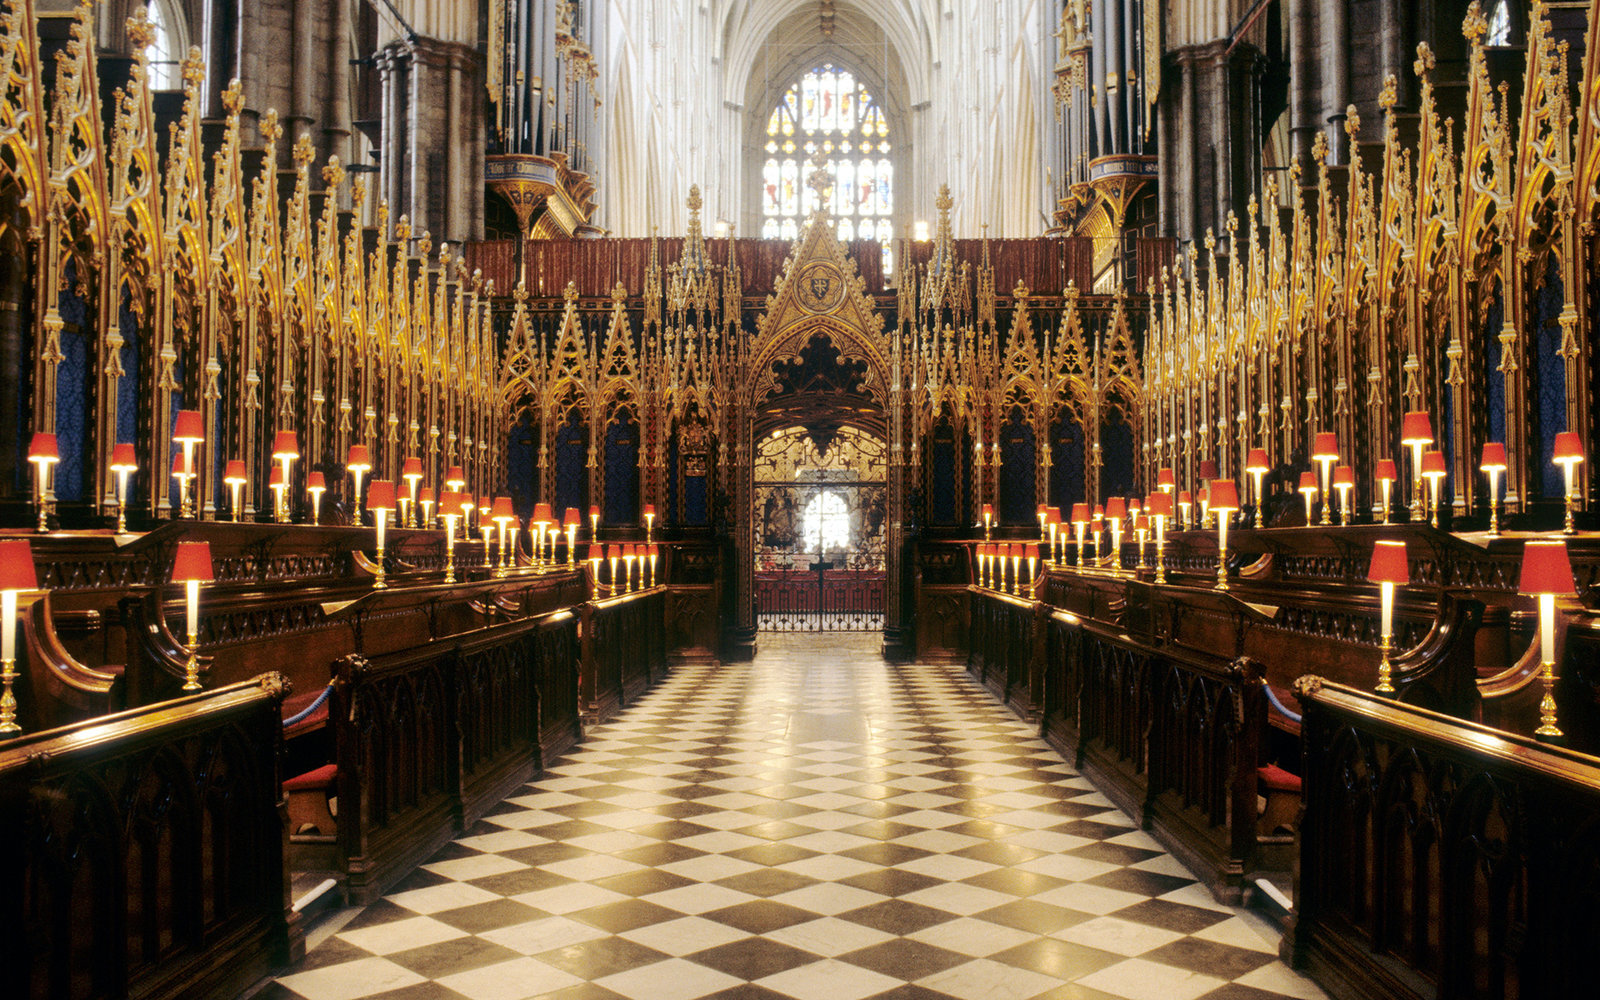 westminster-abbey-interior1215.jpg